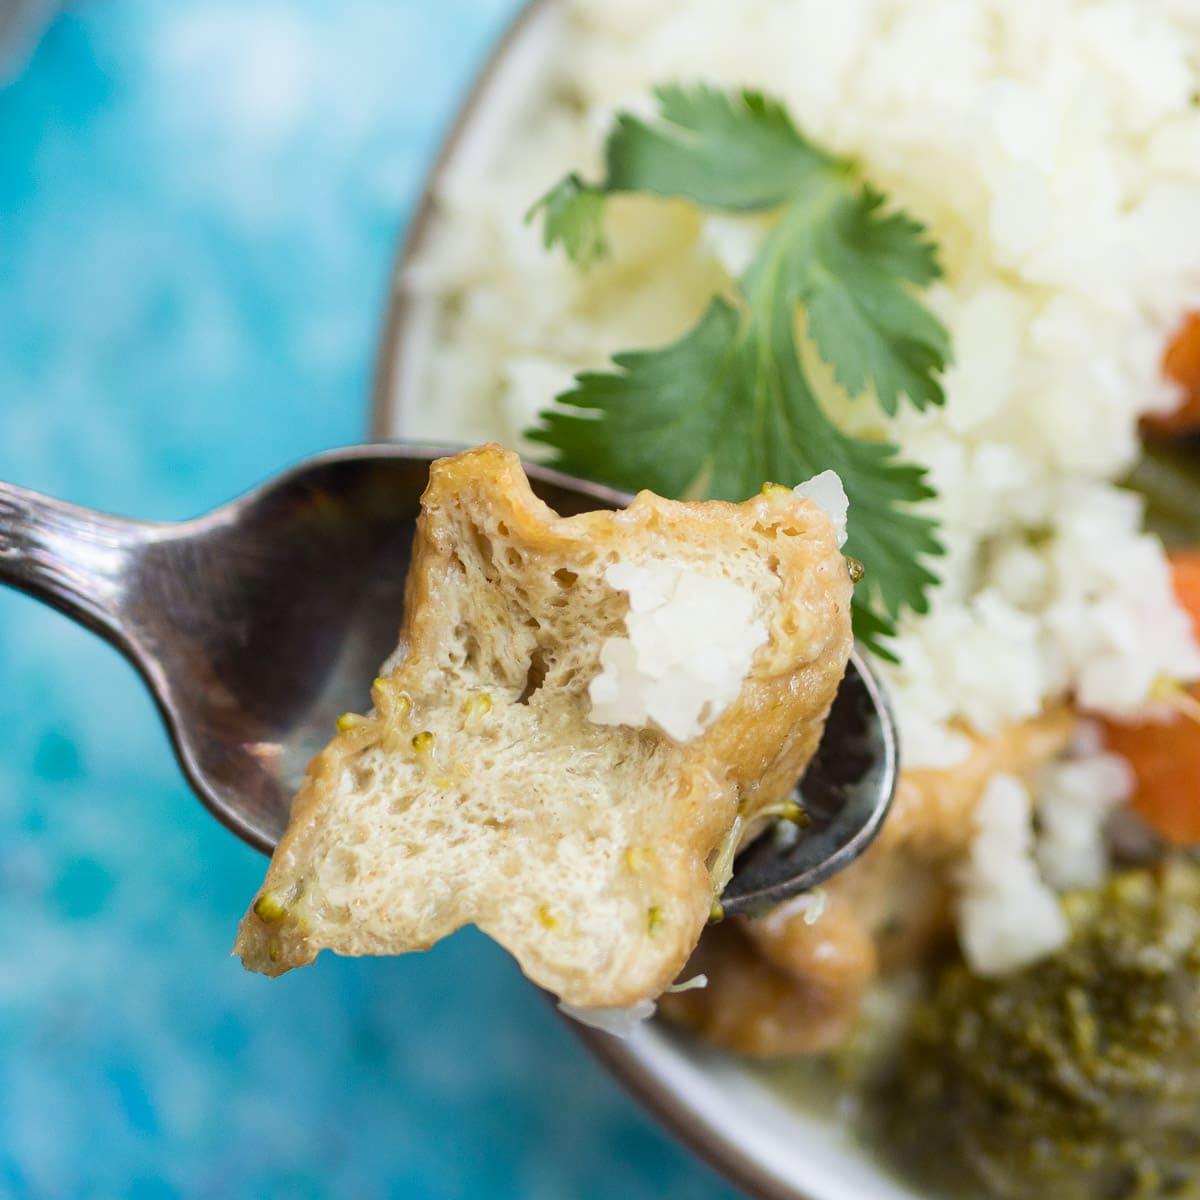 What Is Tofu Sponge? How to Identify, Prep, Cook Tofu Sponge